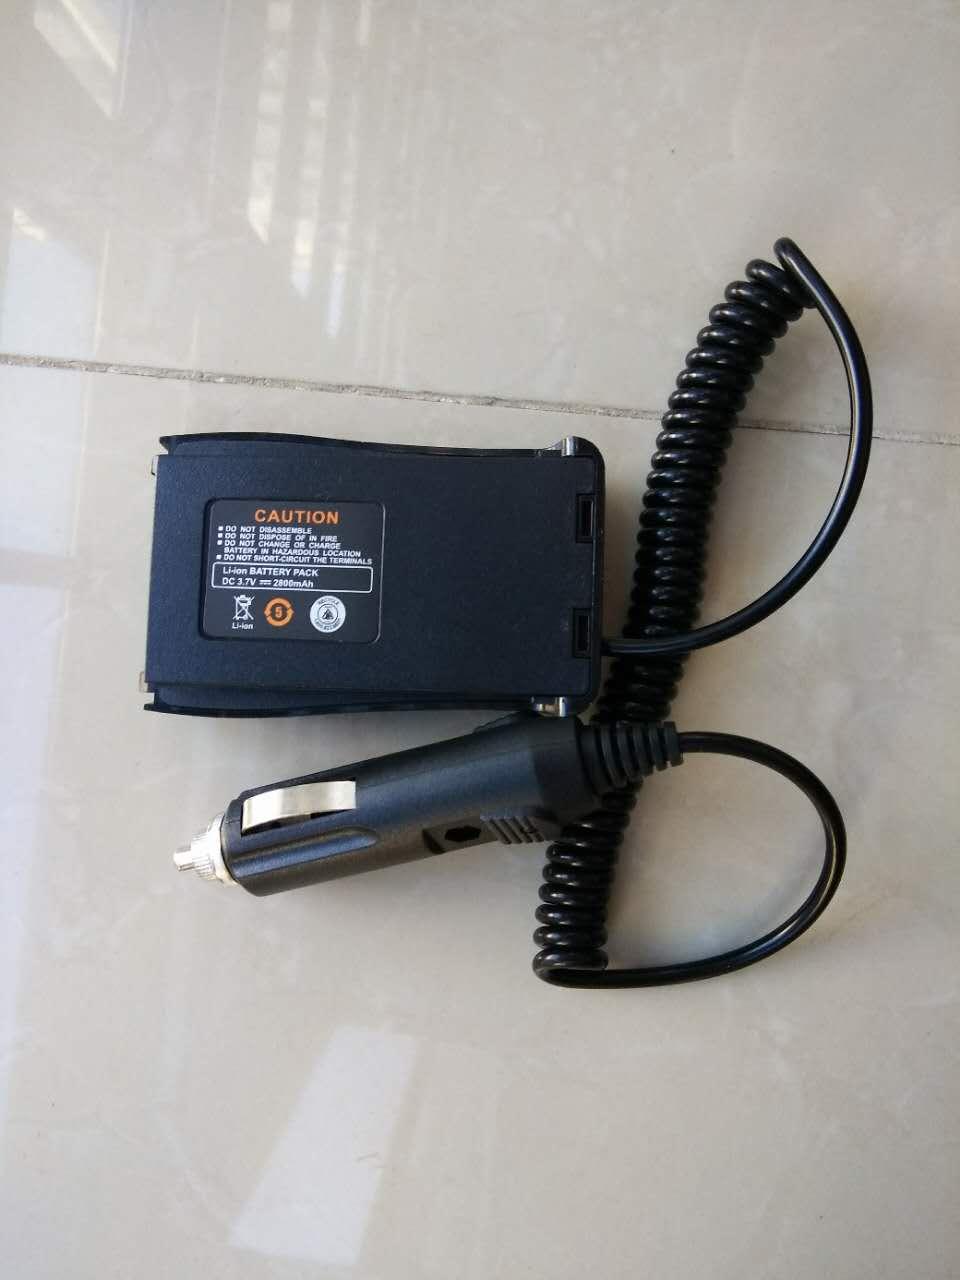 Image 2 - Baofeng 888S walkie talkie eliminator car charger Battery Case Eliminator Baofeng bf 888s Car Charger For BF 888S H 777 H777 666-in Walkie Talkie from Cellphones & Telecommunications